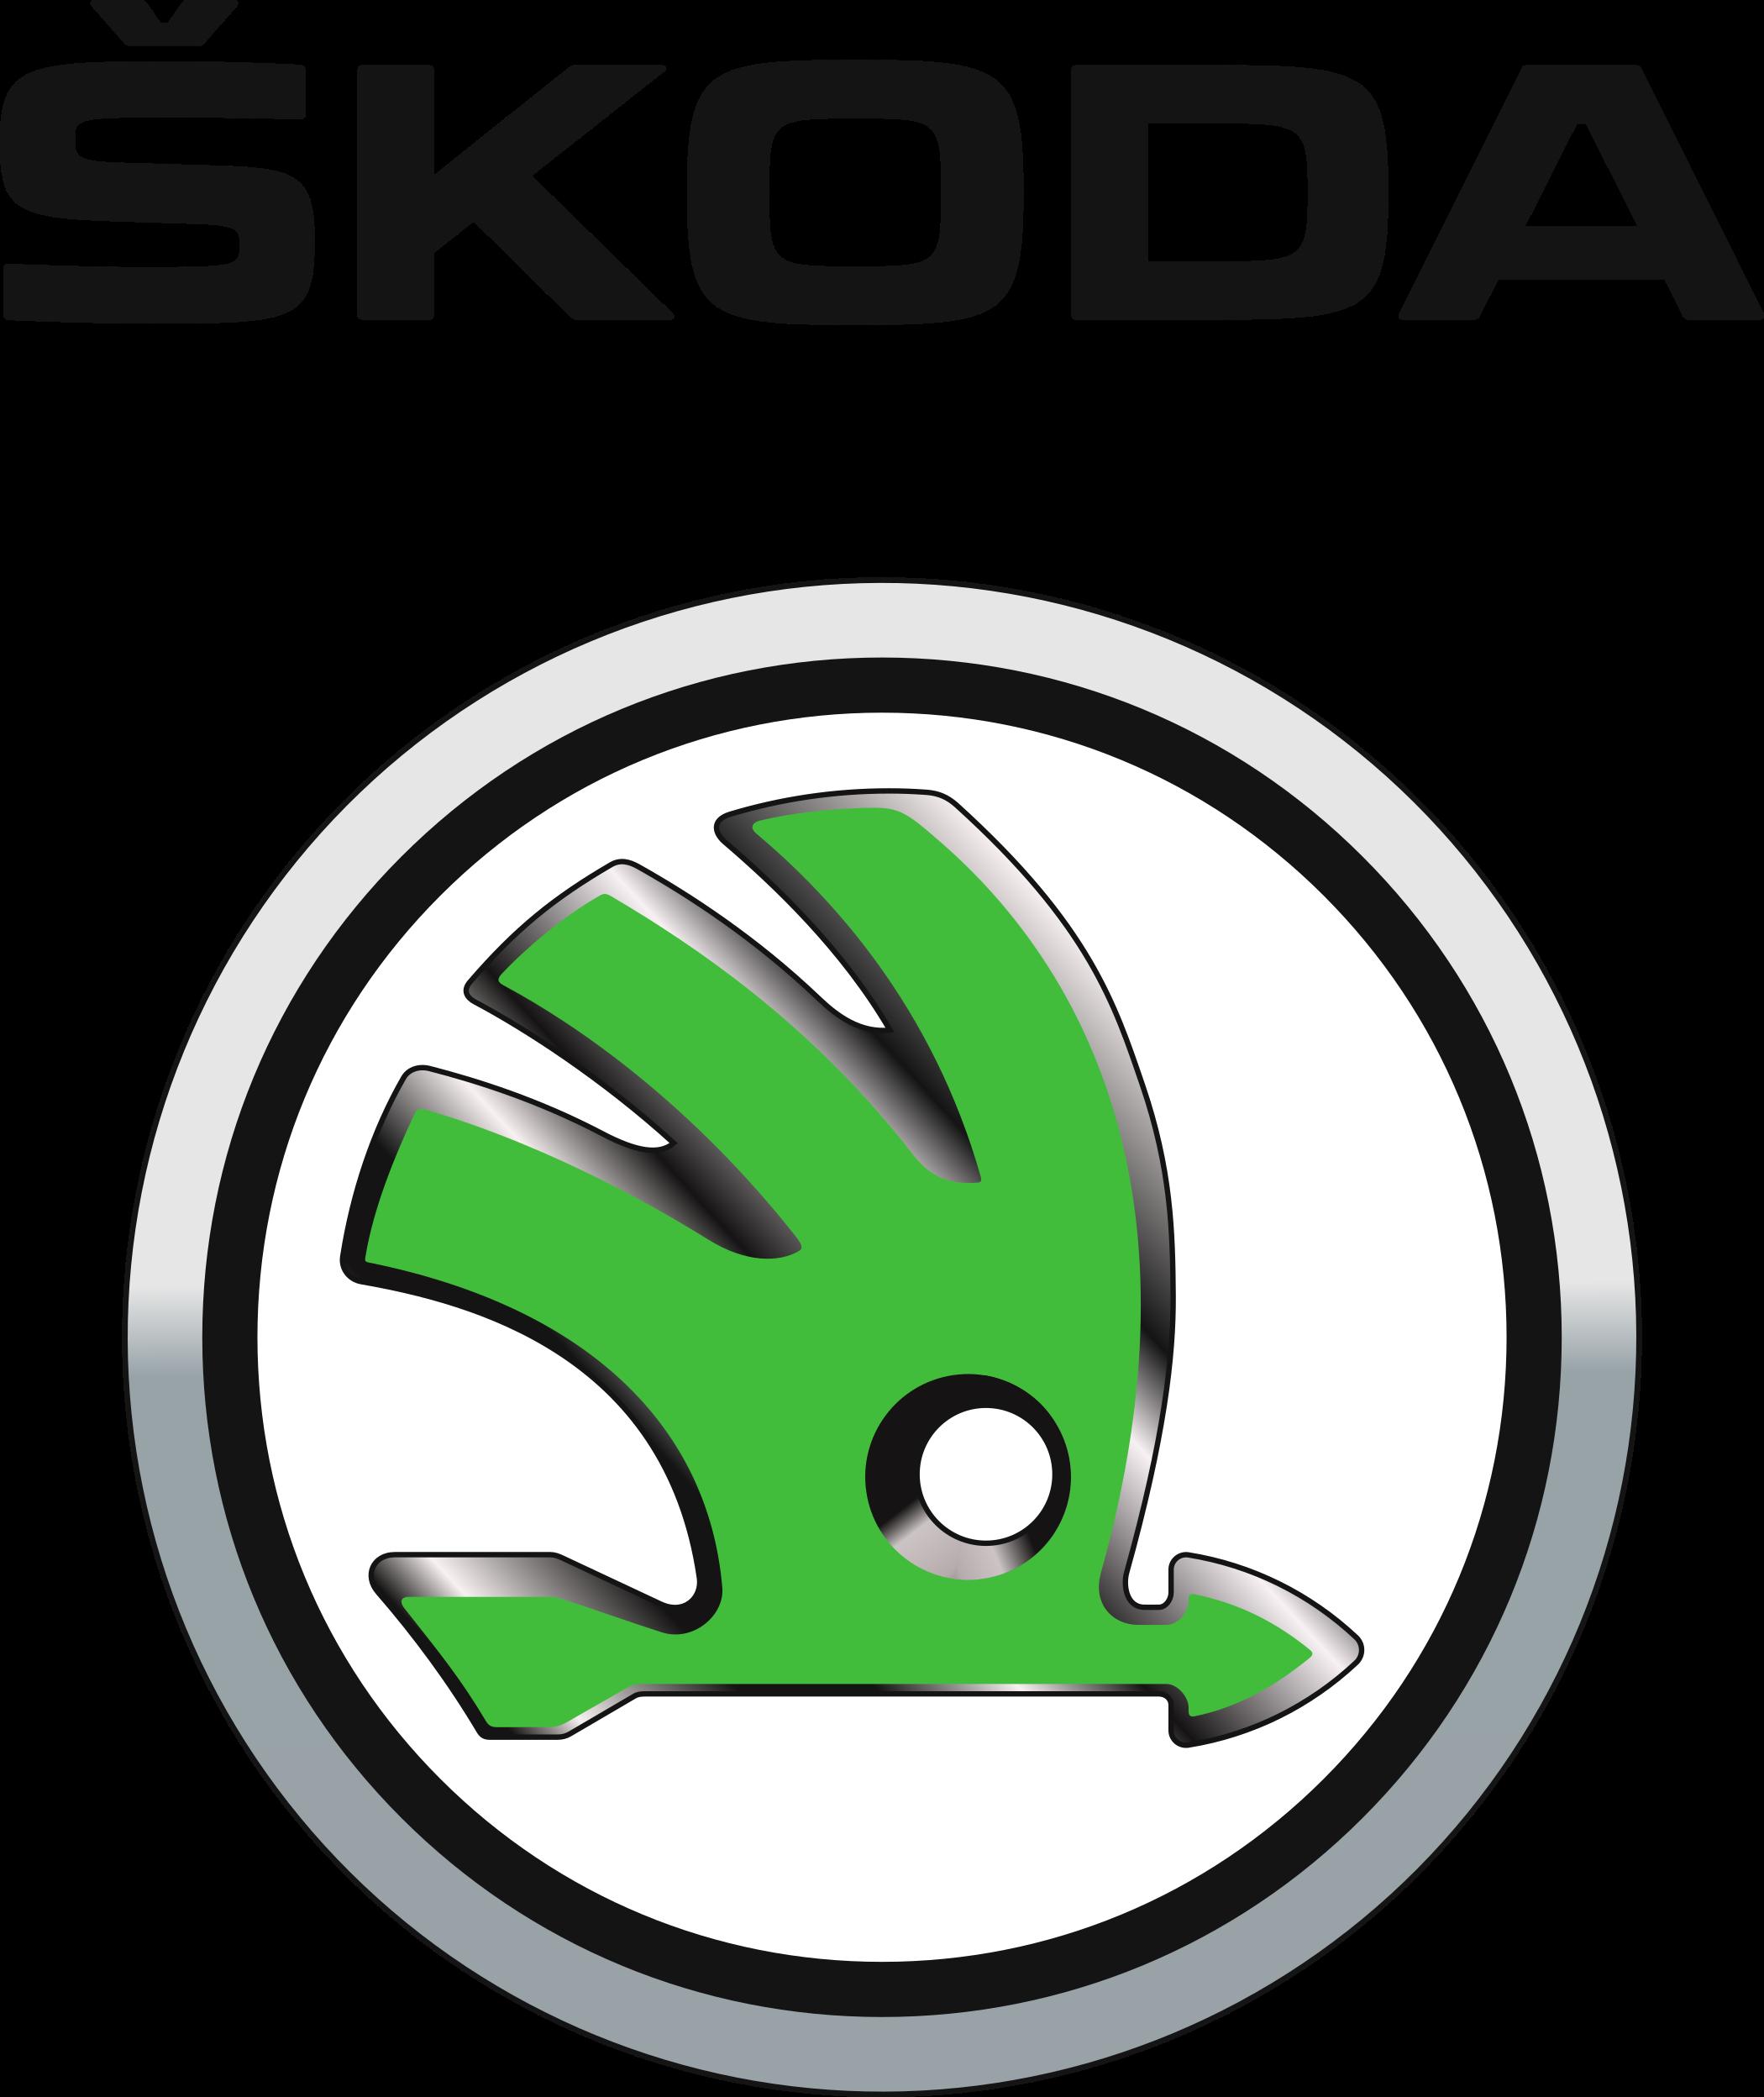 skoda-auto-logo-3